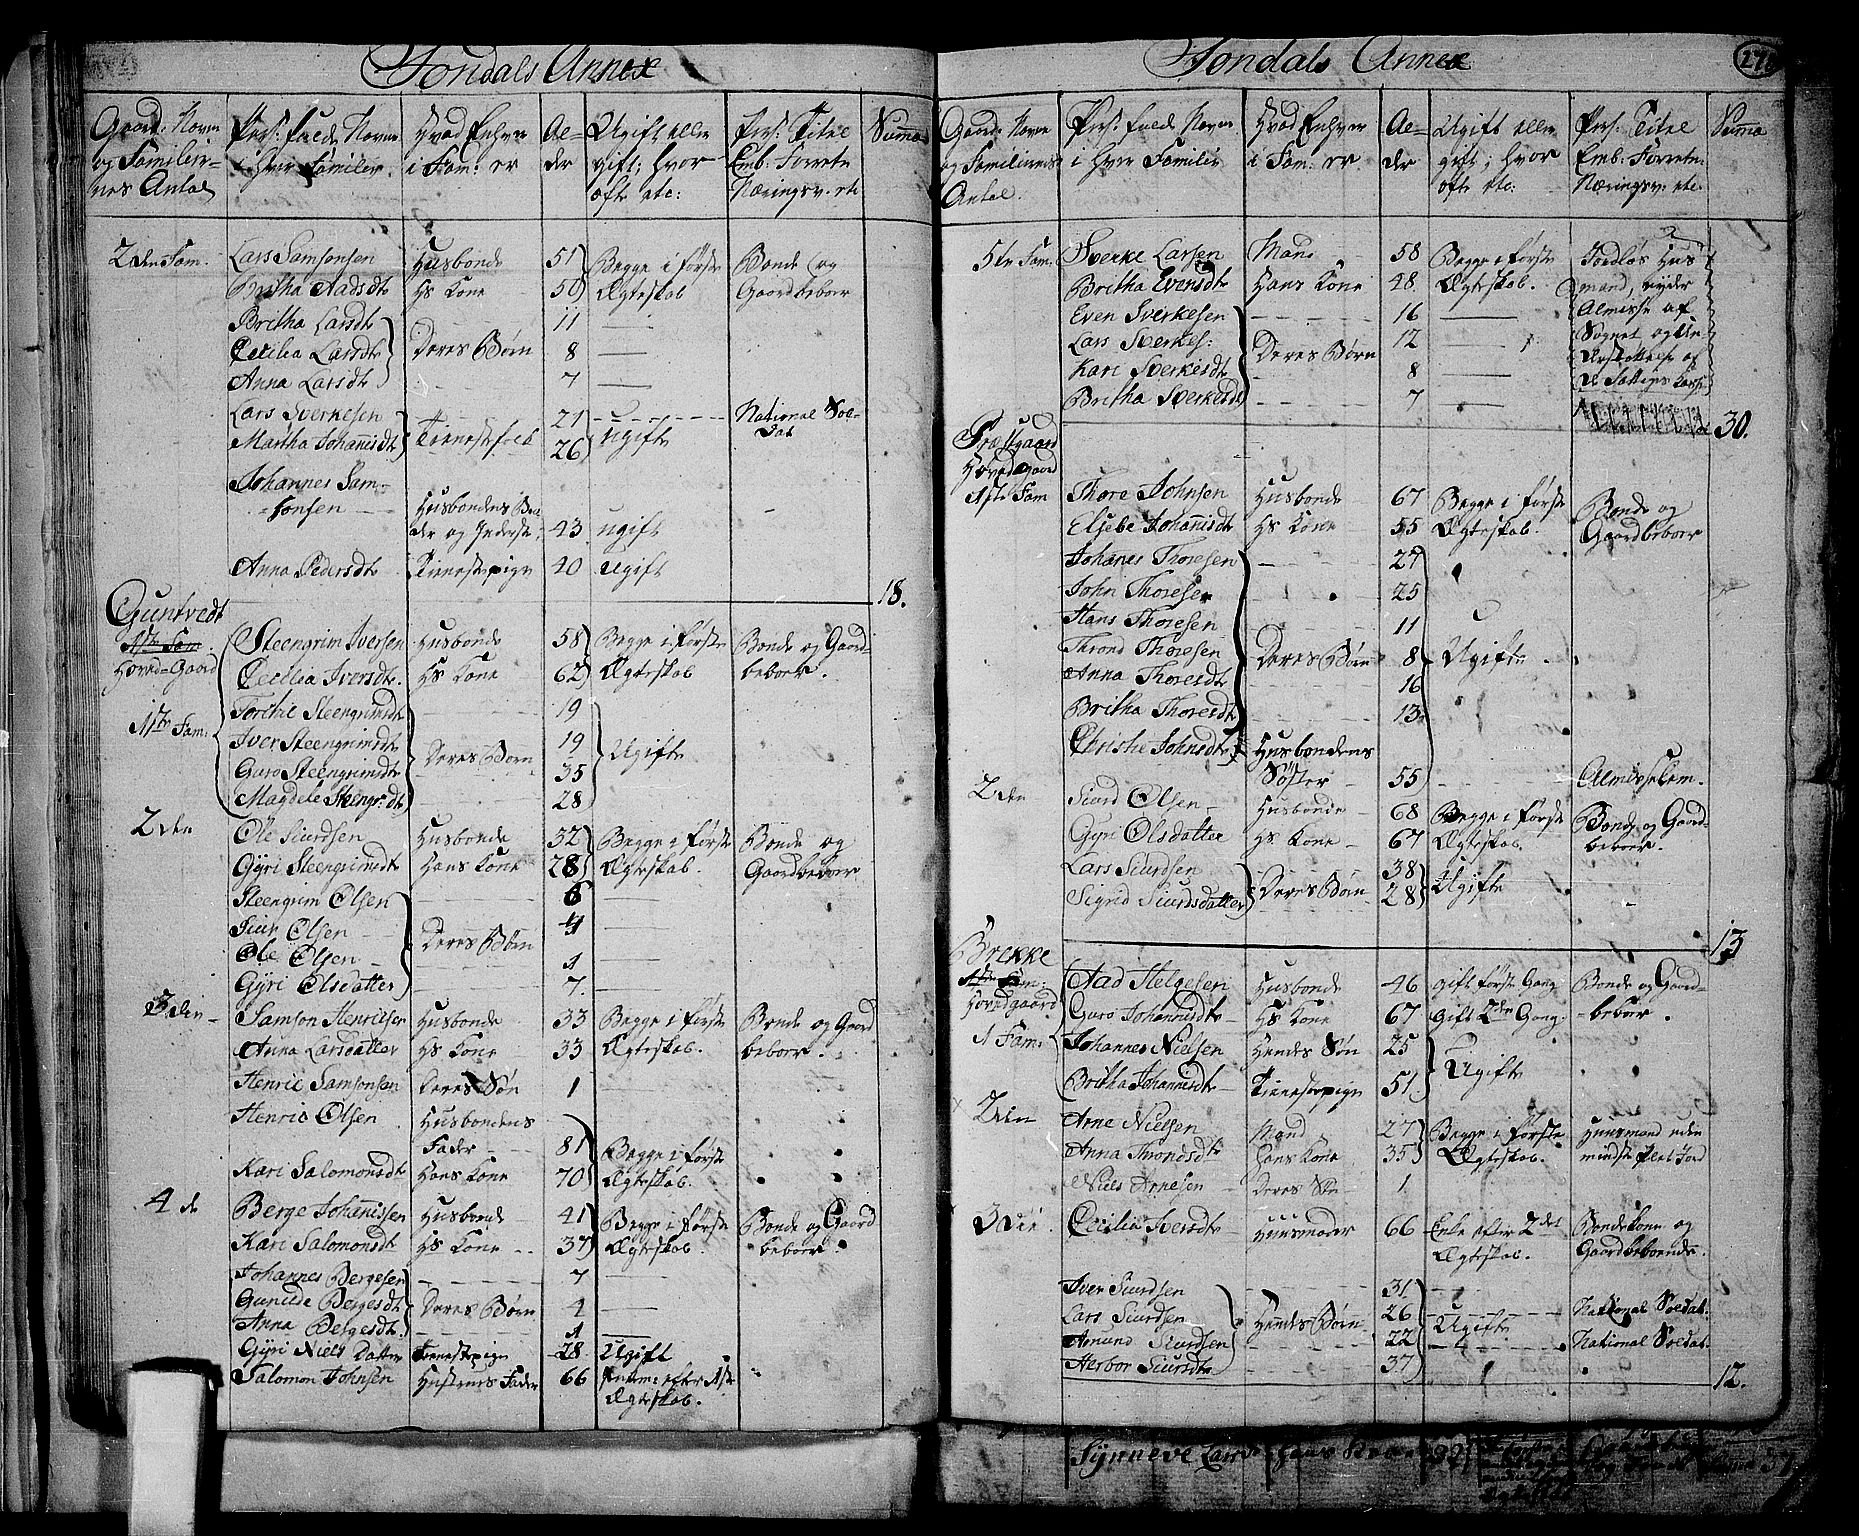 RA, Folketelling 1801 for 1226P Strandebarm prestegjeld, 1801, s. 269b-270a